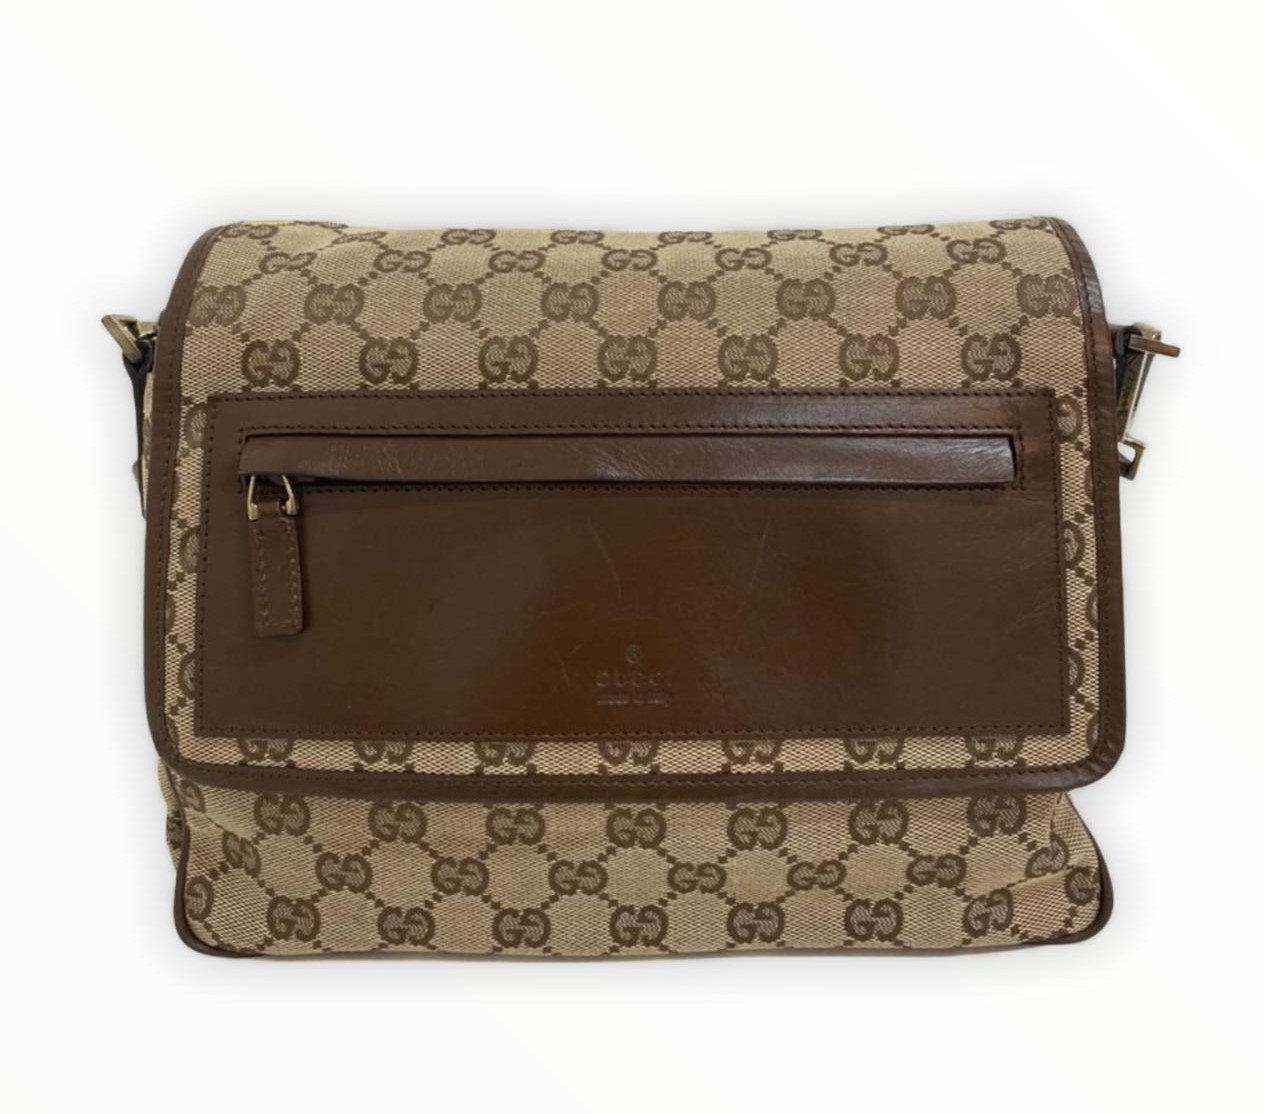 Bolsa Gucci GG Monogram Crossbody